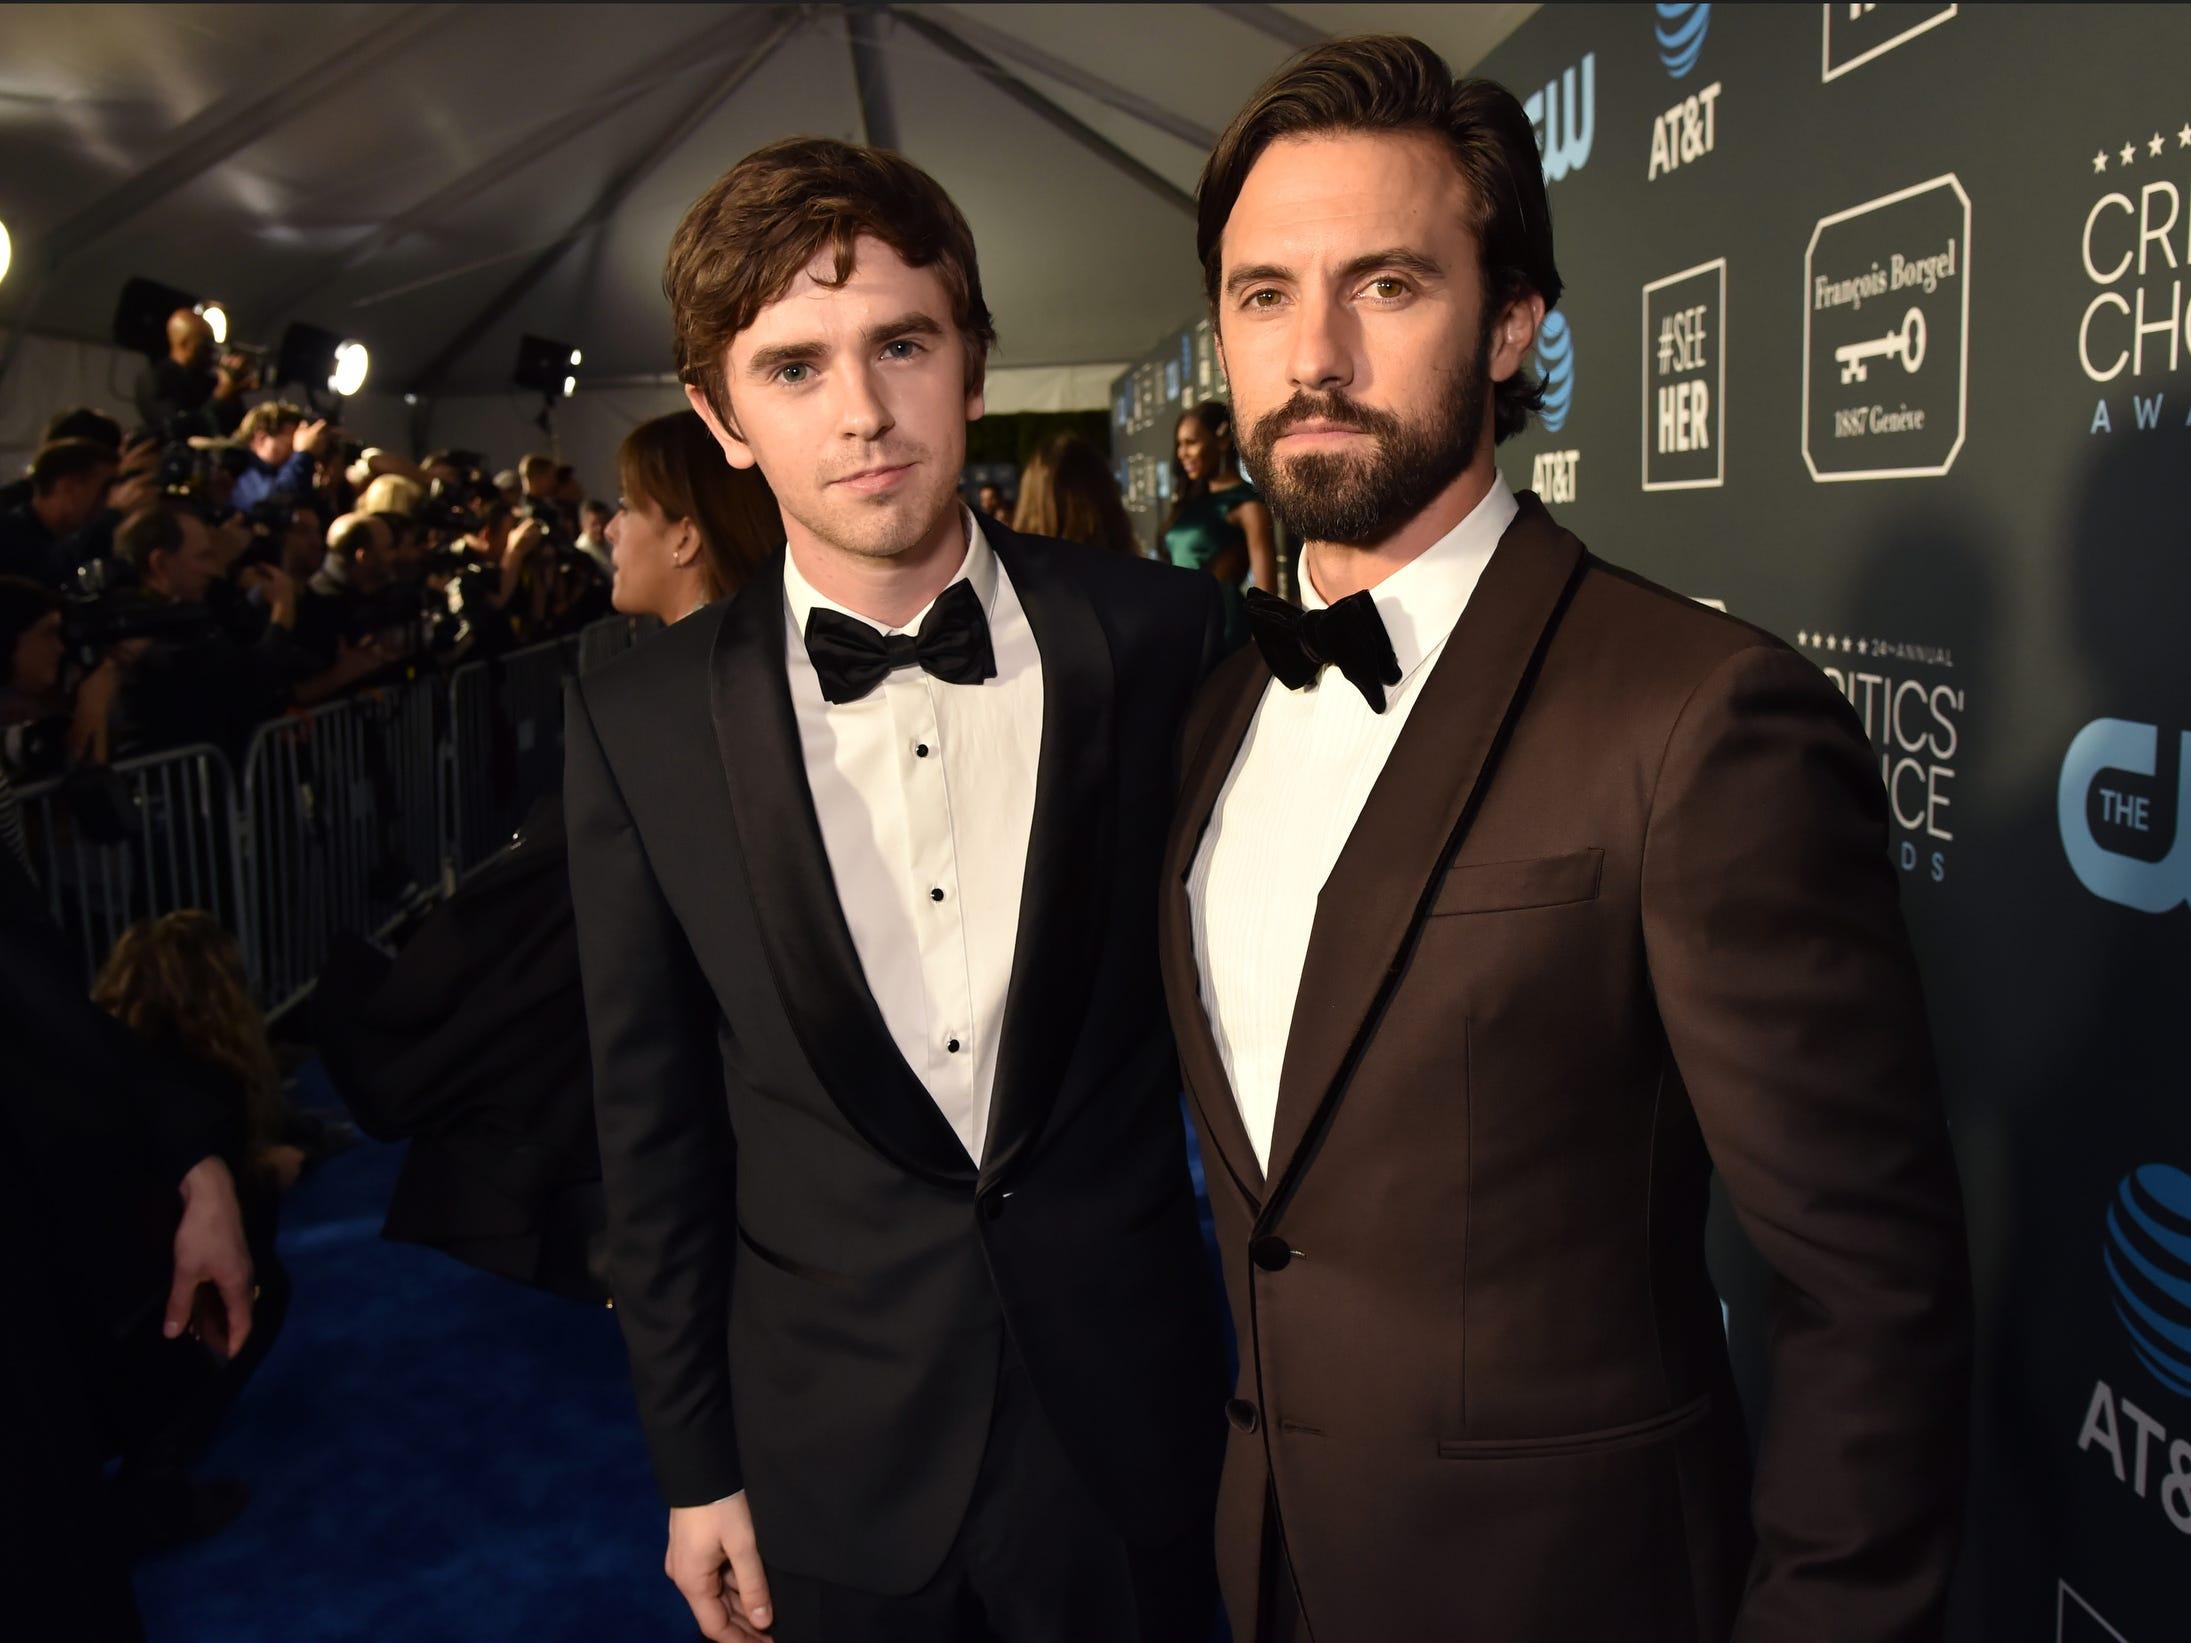 Freddie Highmore (L) and Milo Ventimiglia pose for photographers.